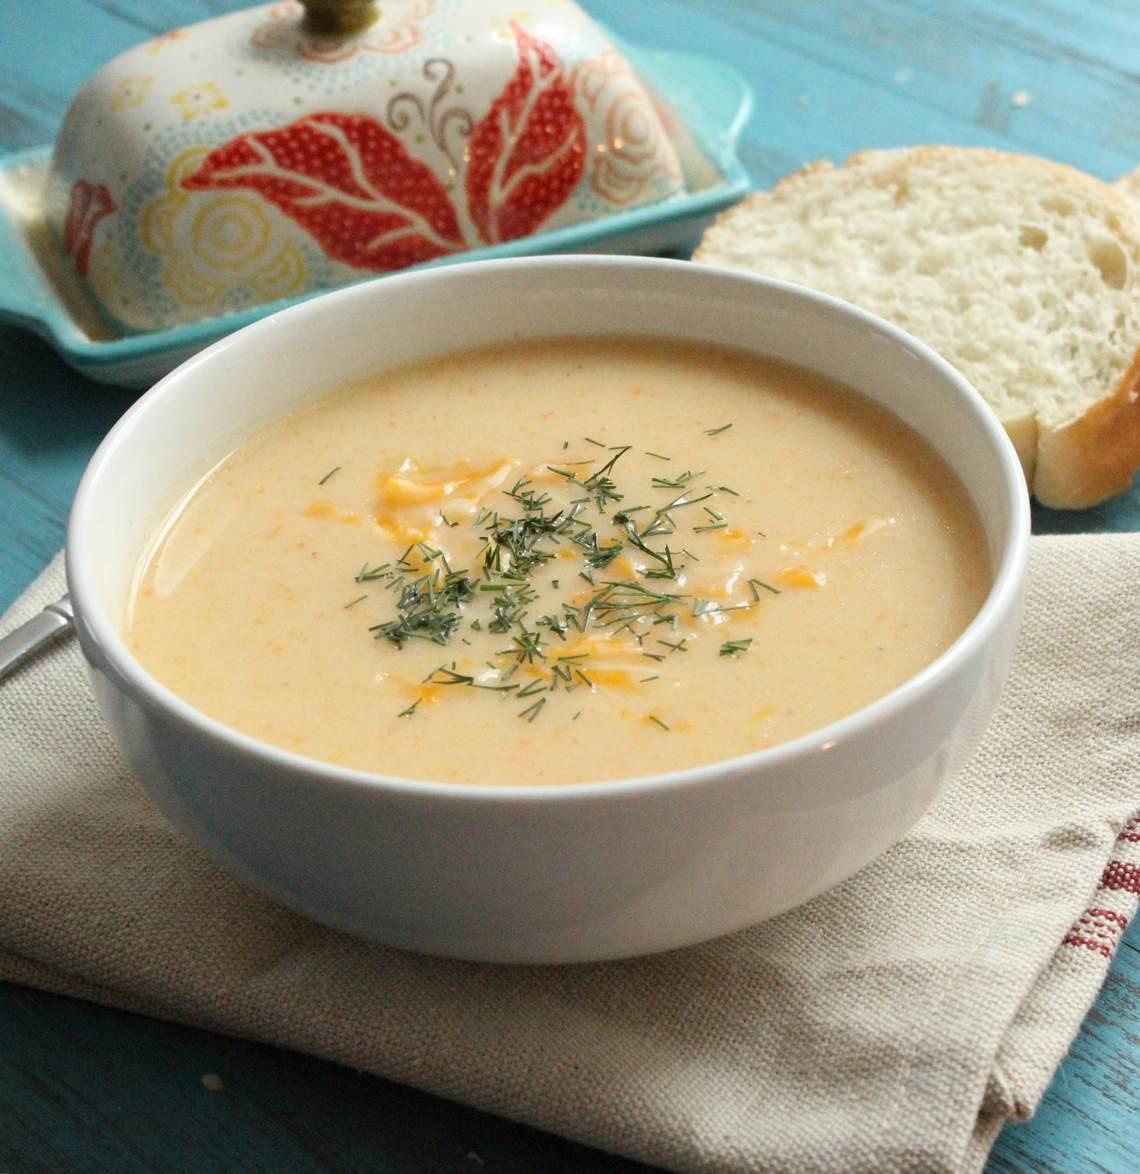 Cauliflower Cheese Soup  Cauliflower Cheese Soup II Glorious Soup Recipes